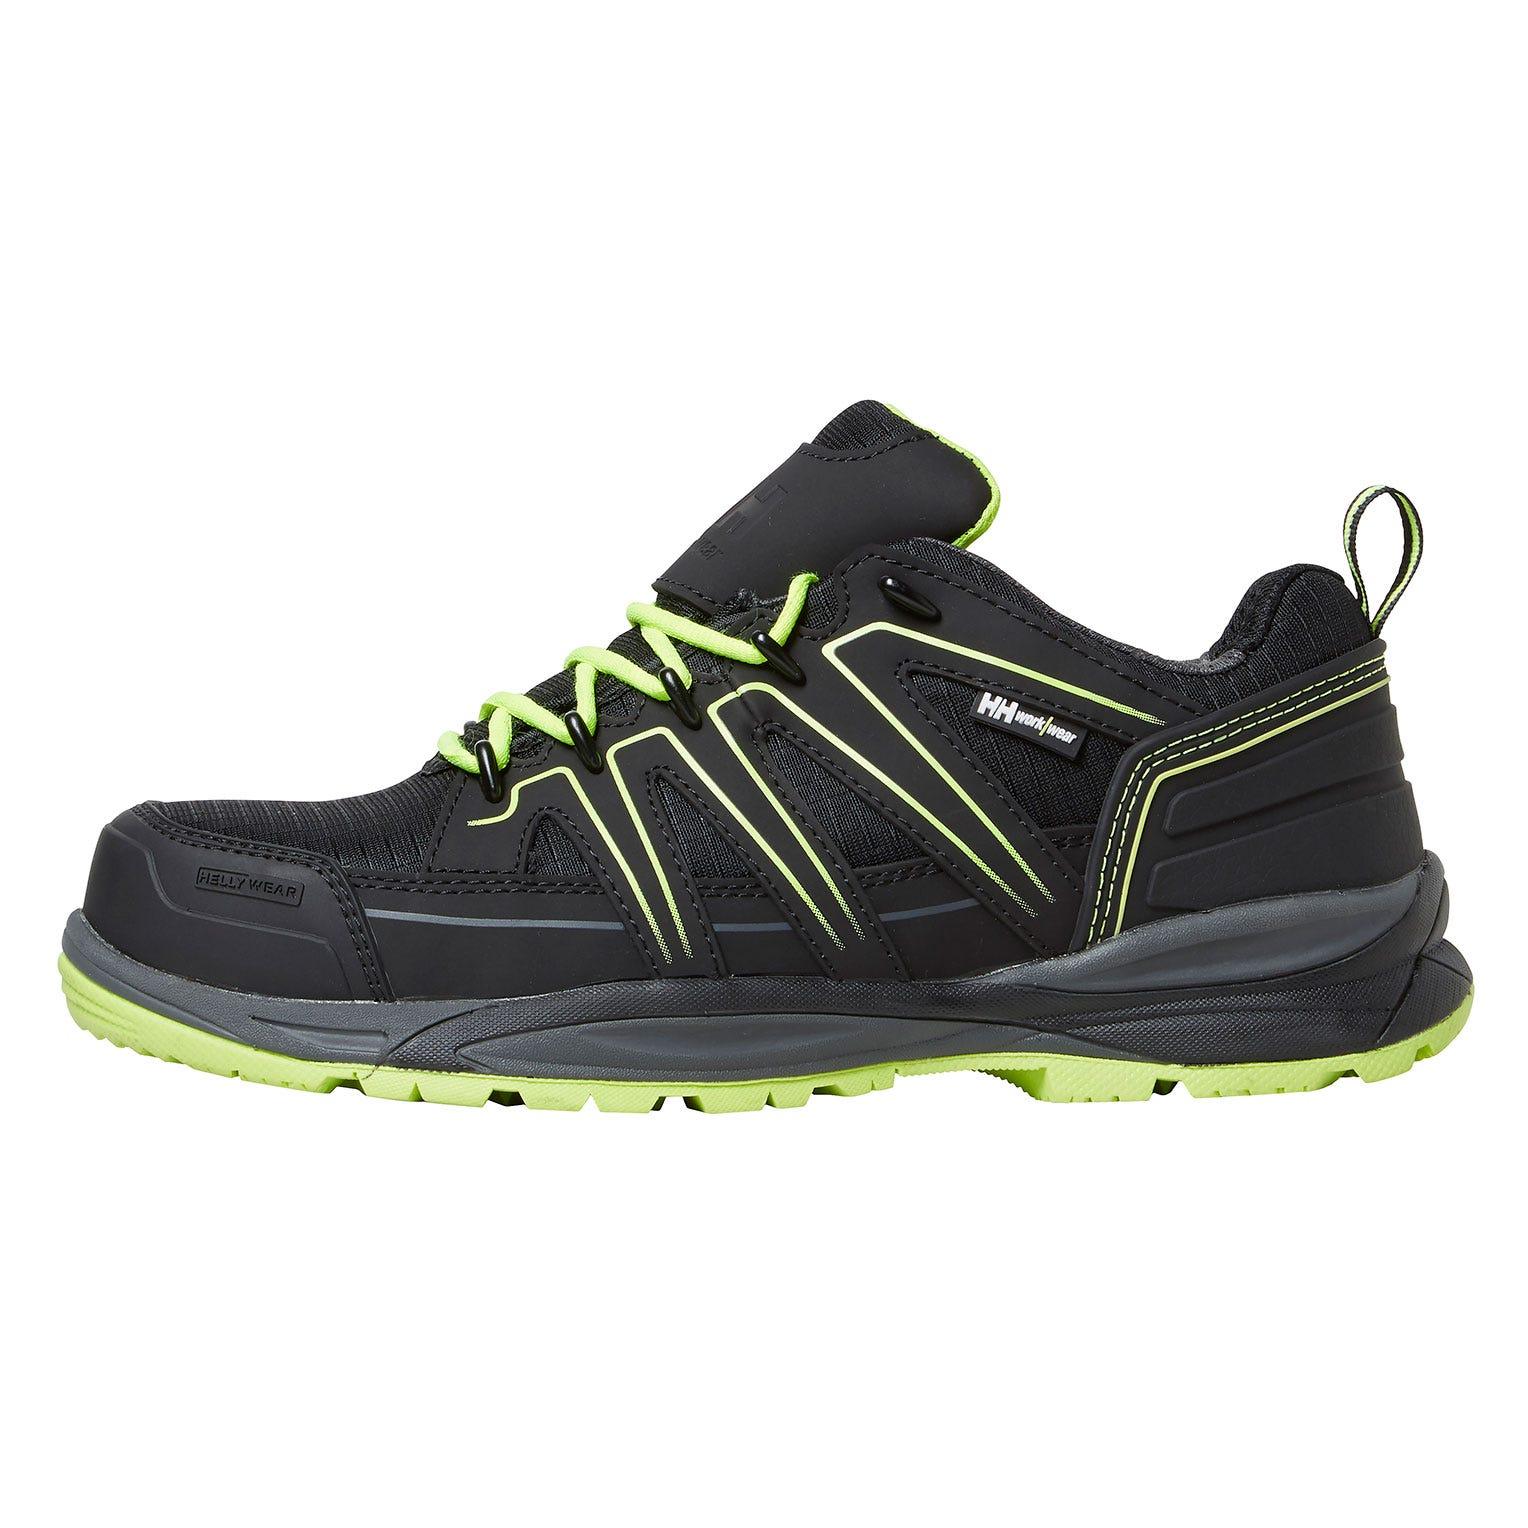 hh workwear workwear helly hansen scarpa antinfortunistica addvis certificata s3 con punta in materiale composito 40 nero